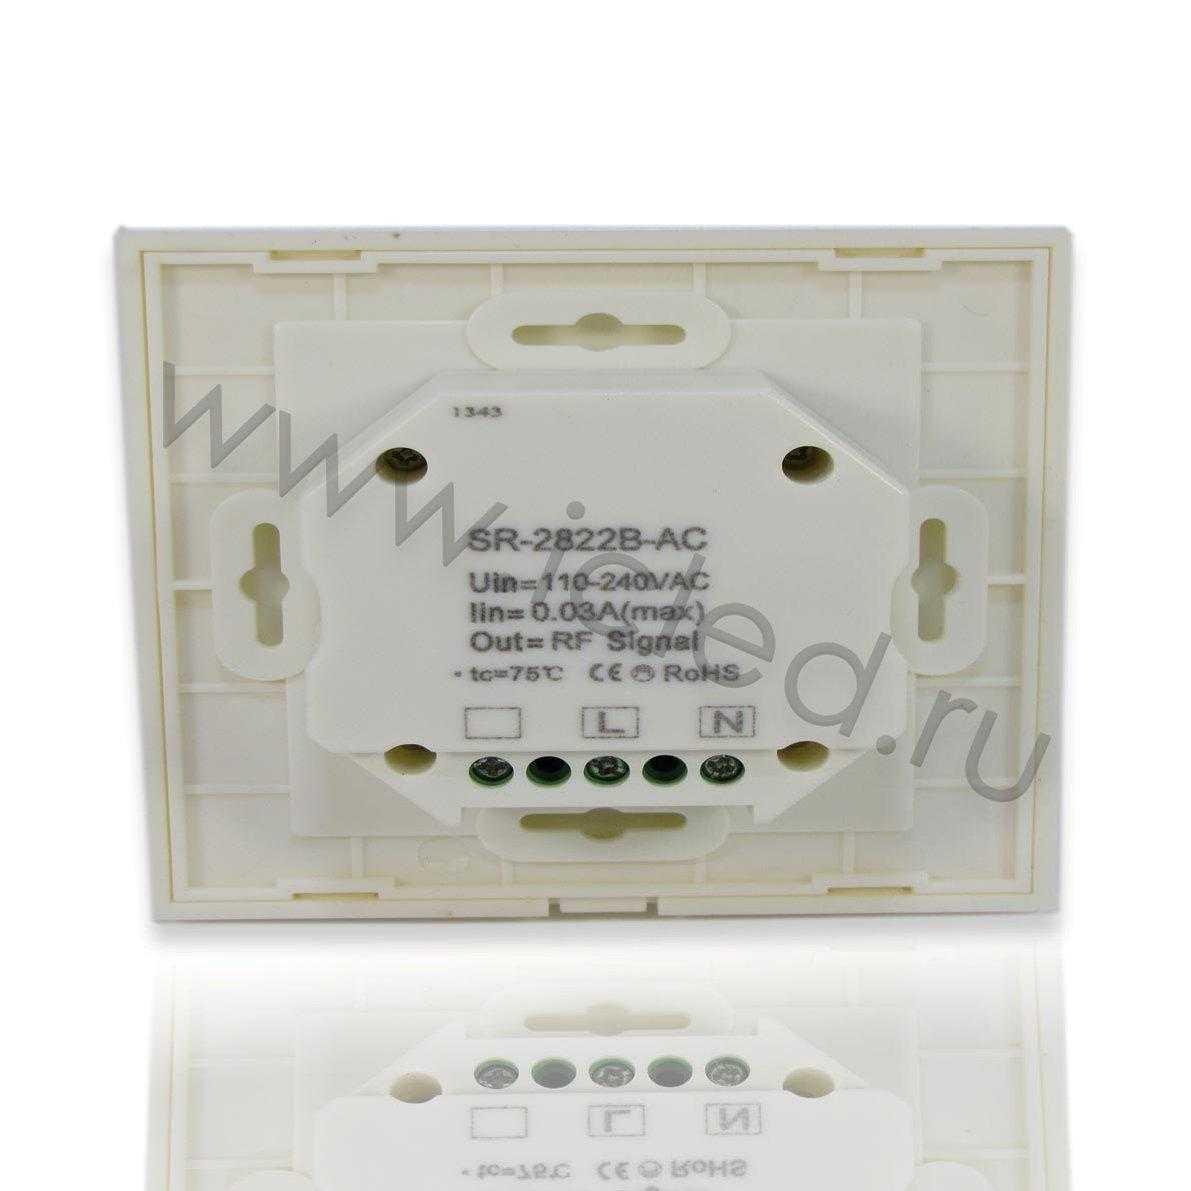 Сенсорная панель диммер SR-2822B-AC WIFI (2 зоны)